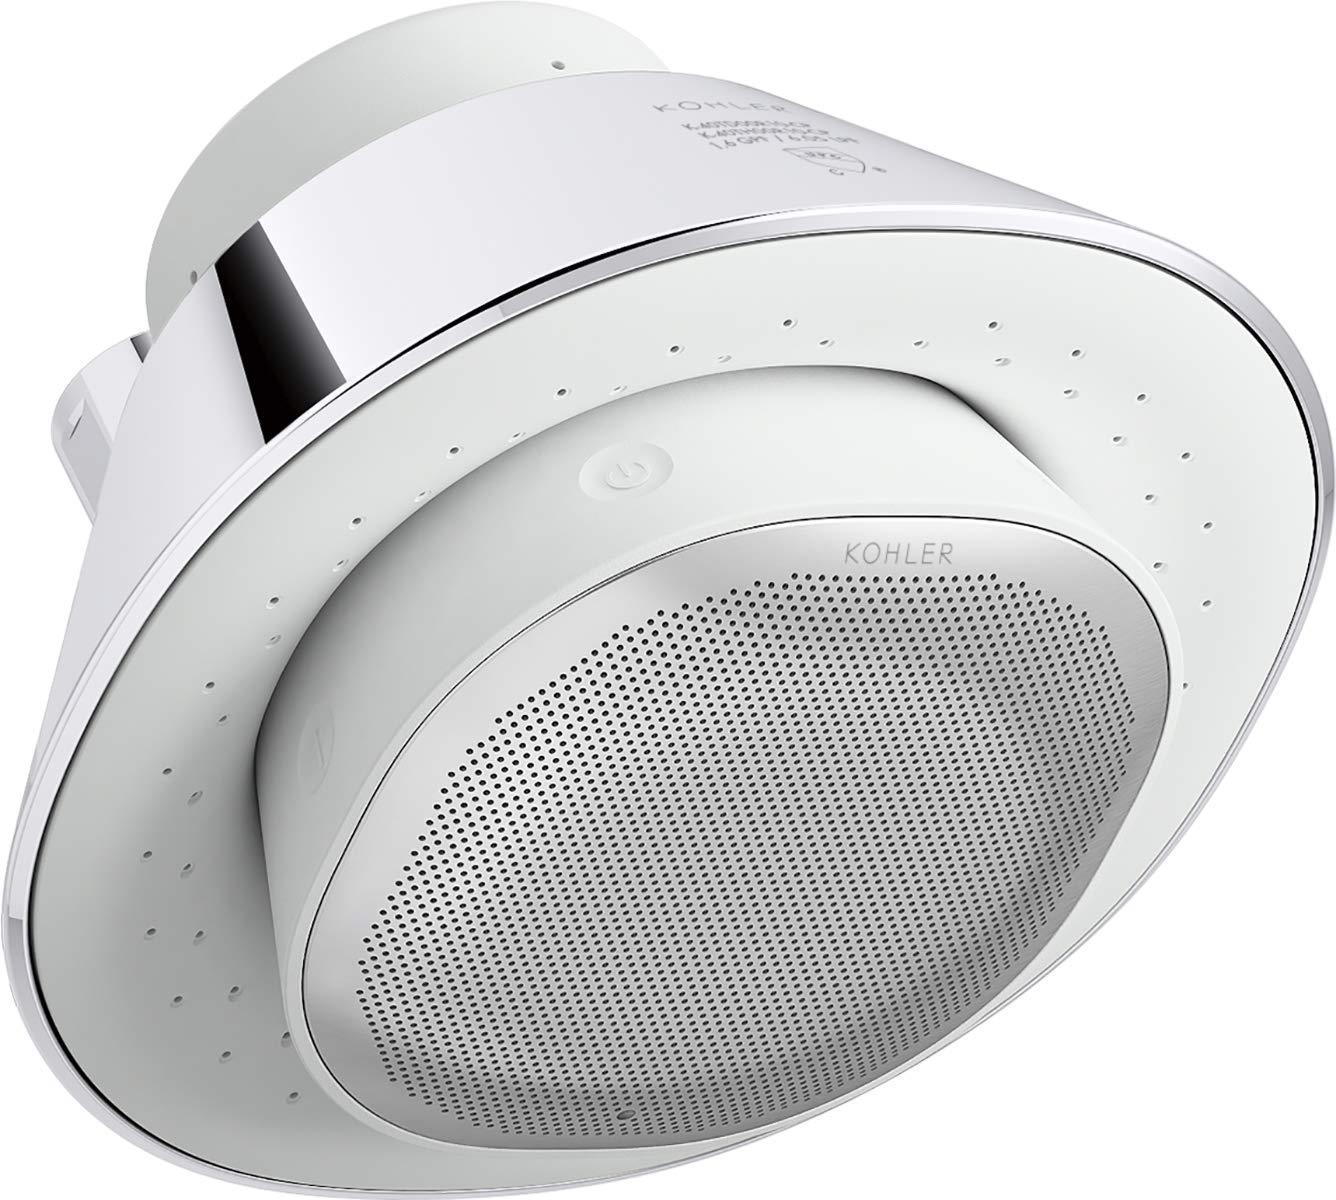 KOHLER Moxie Bluetooth Showerhead, Shower Speaker, Waterproof Speaker, Shower Radio, Rechargeable Speaker, Portable Speaker, 2.5 GPM, K-28238-NKE-CP, Polished Chrome